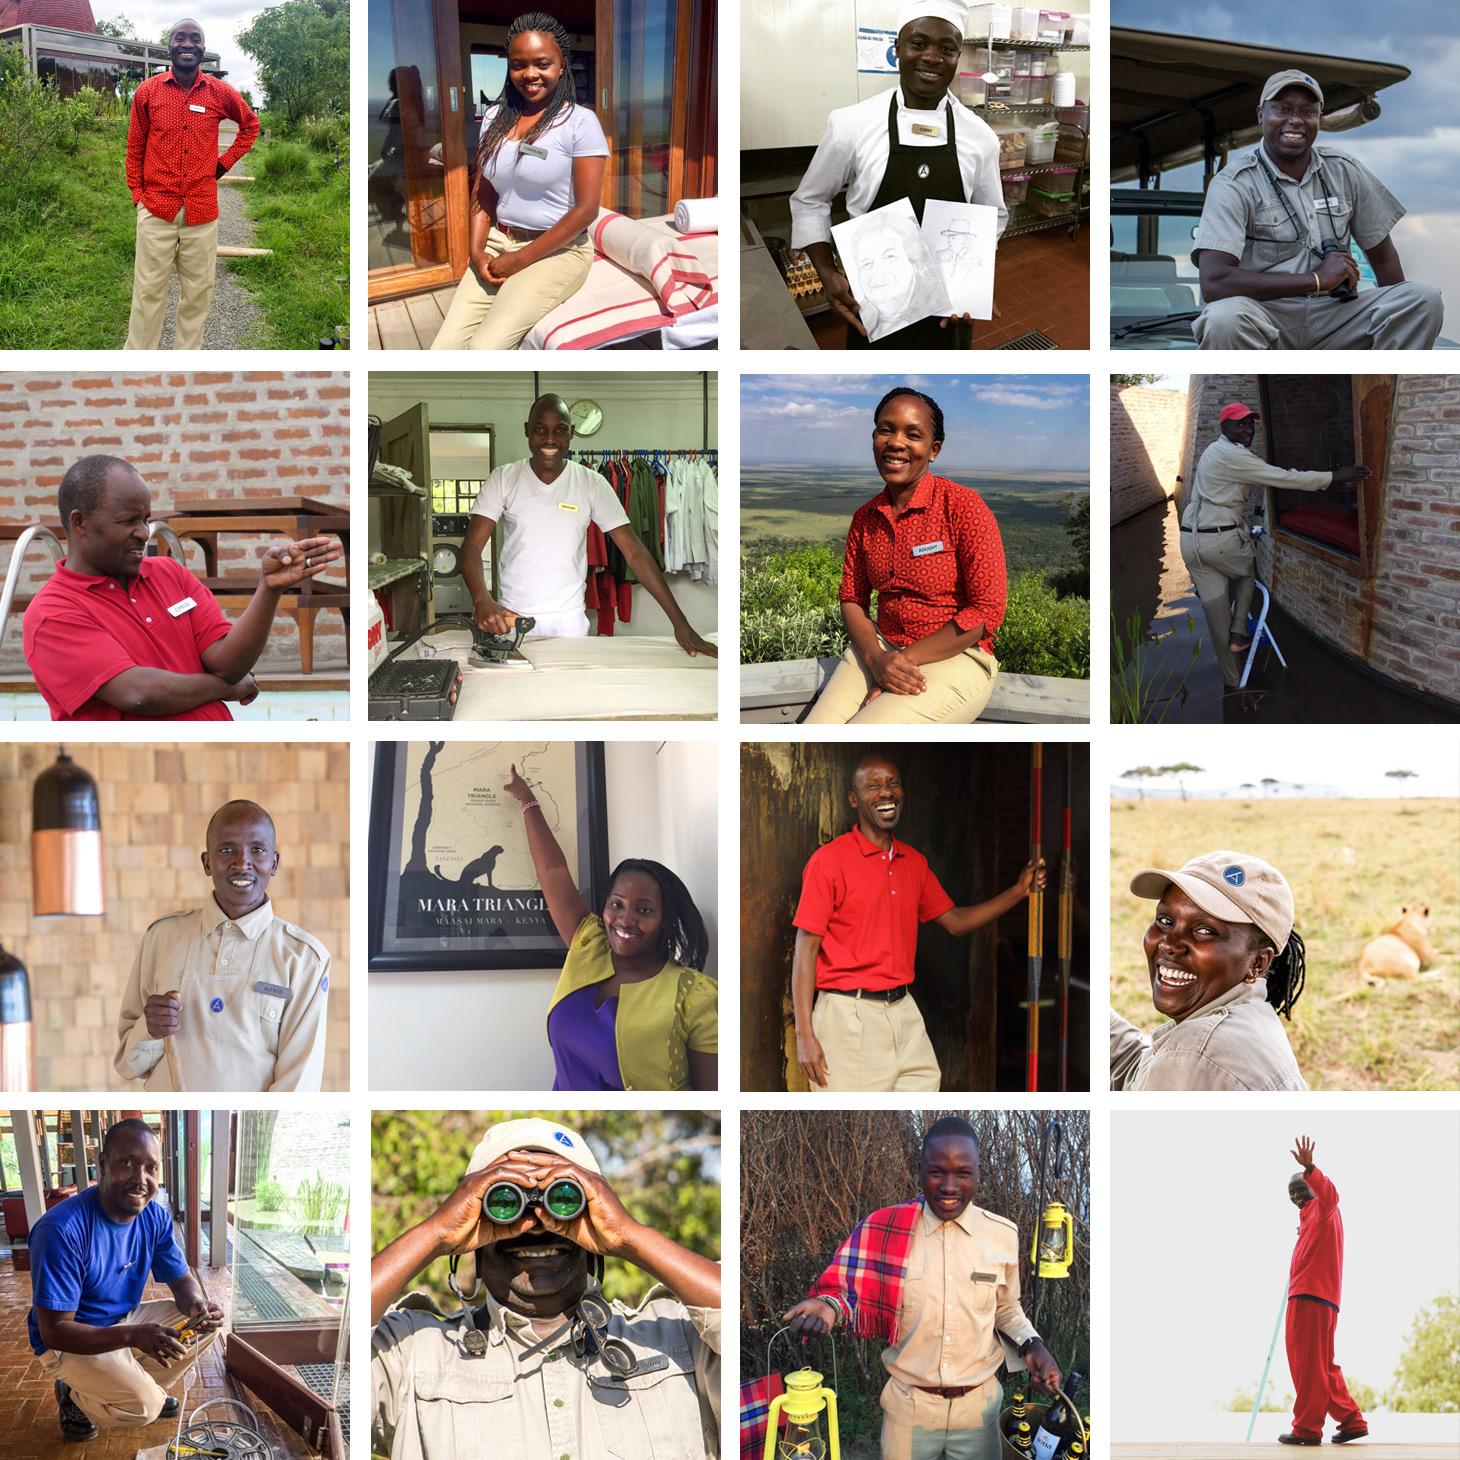 Angama-team collage 1